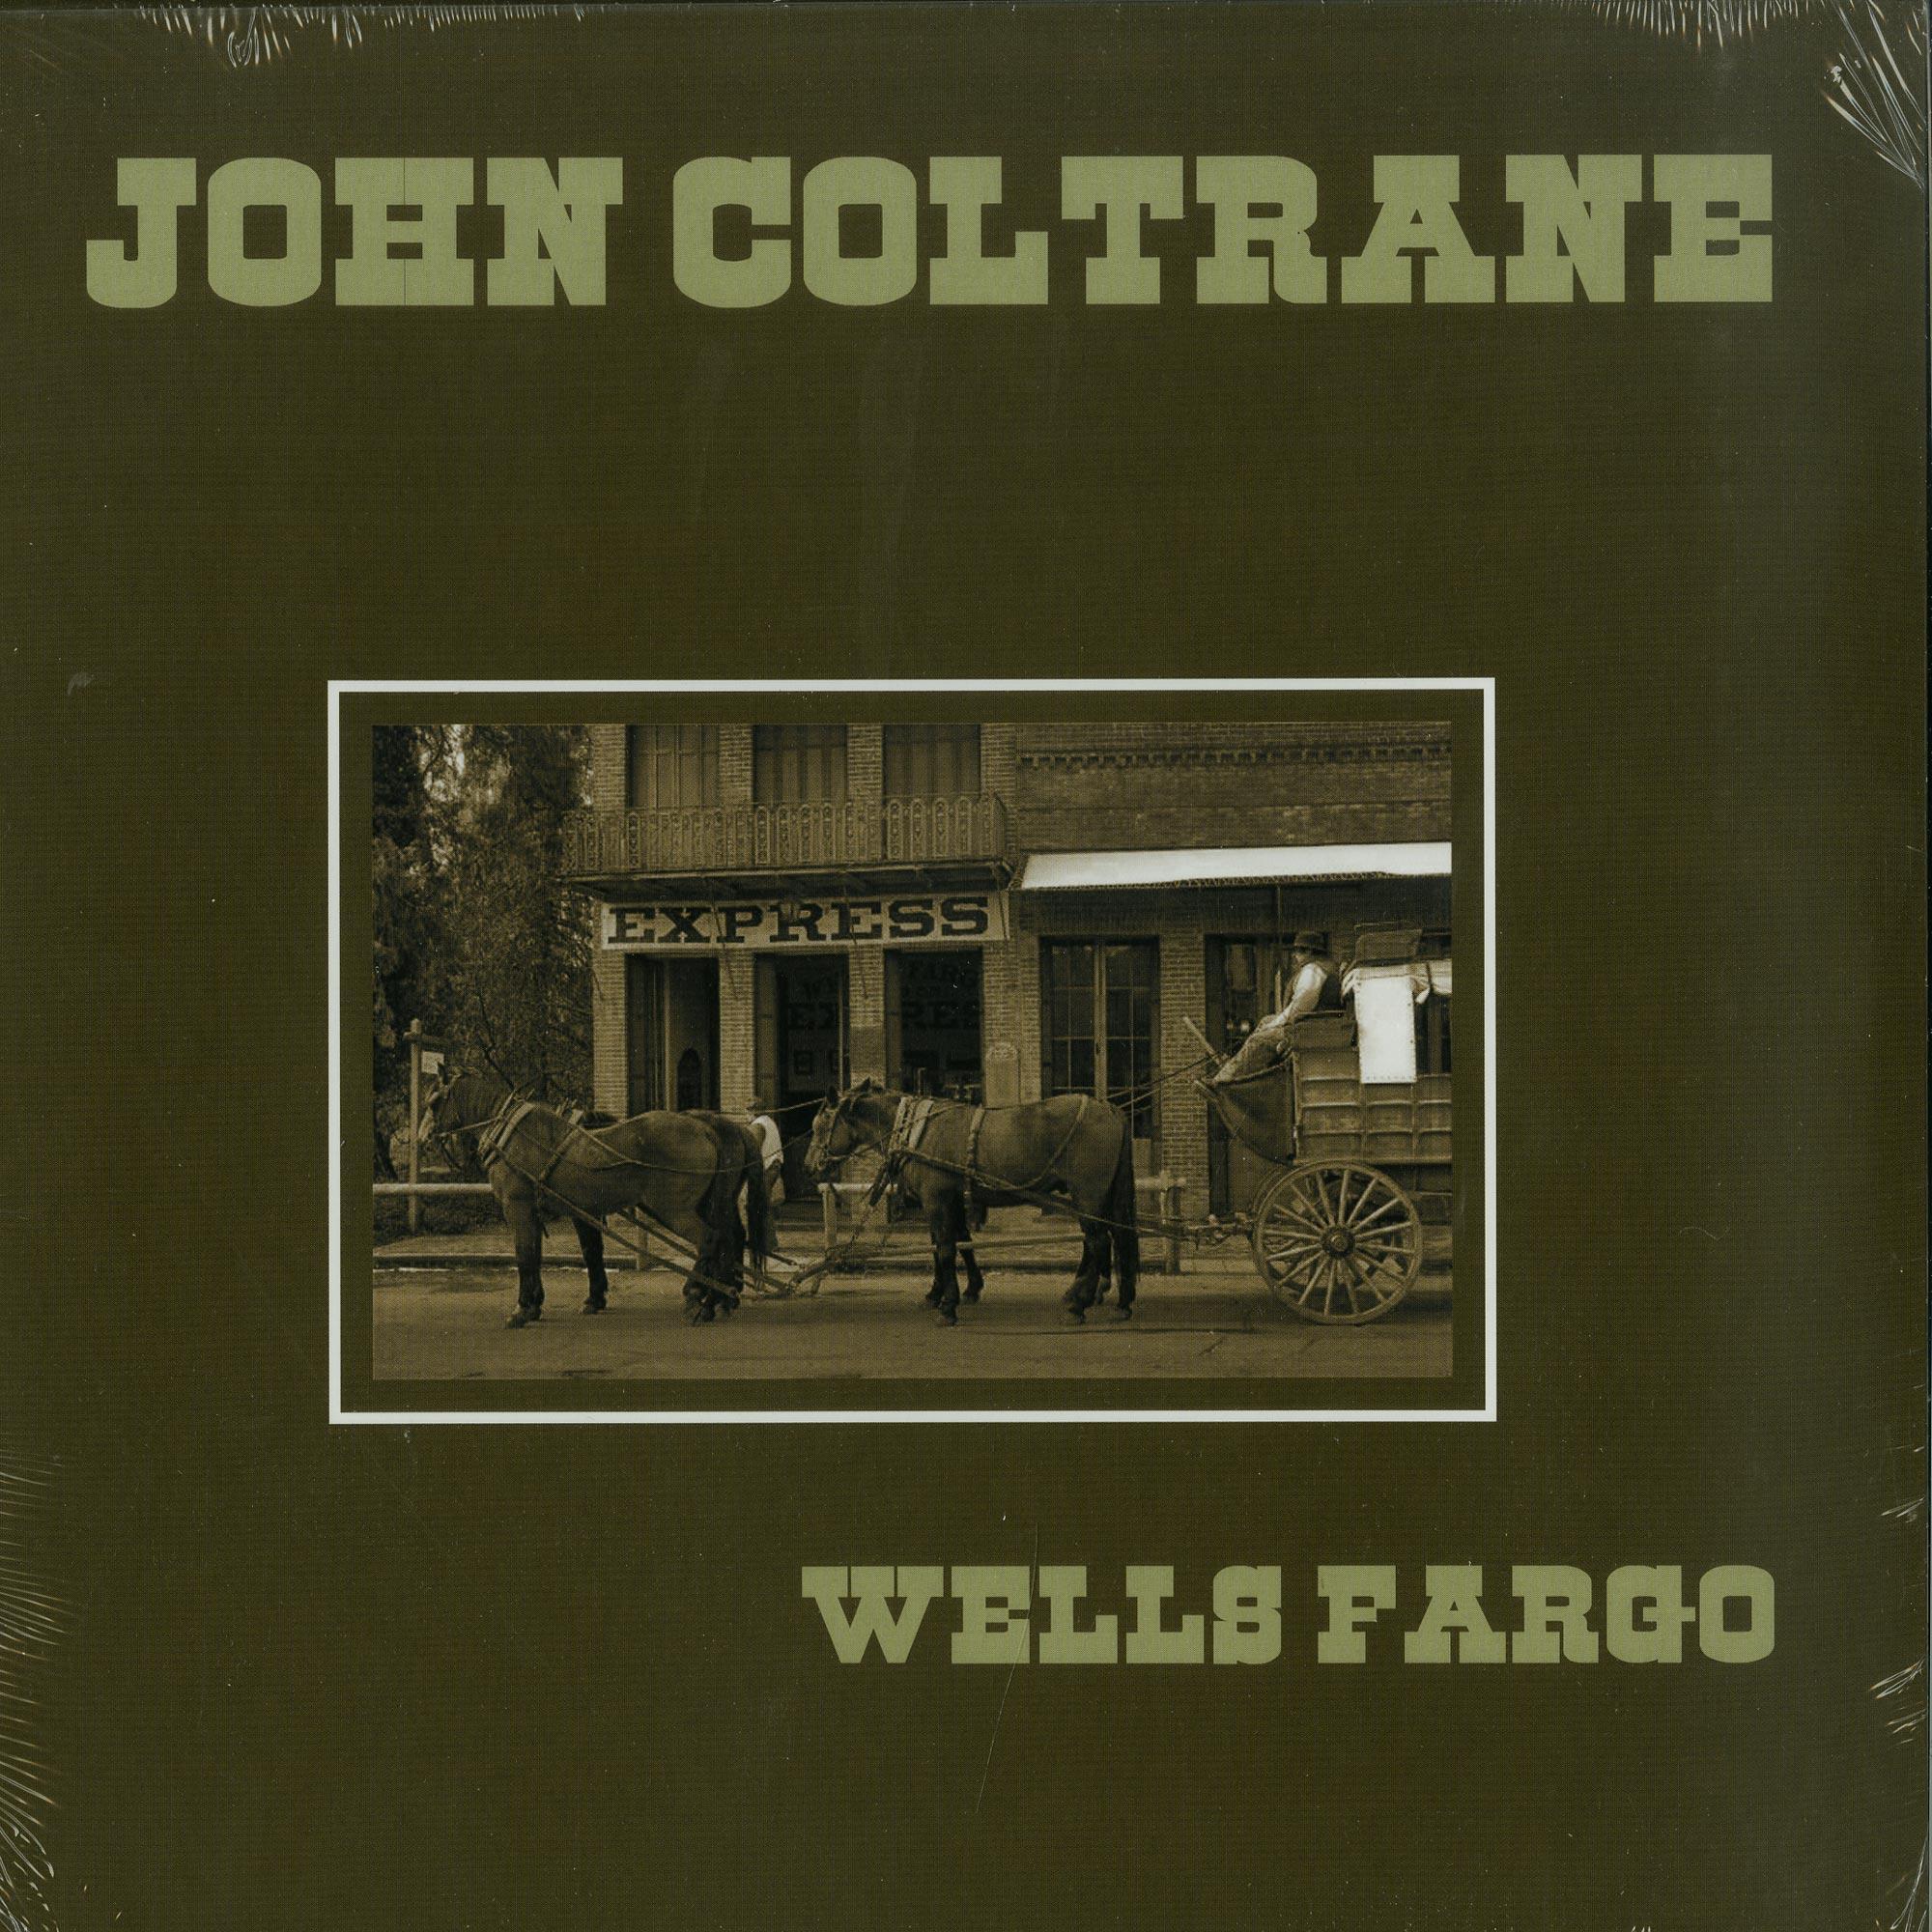 John Coltrane - WELLS FARGO